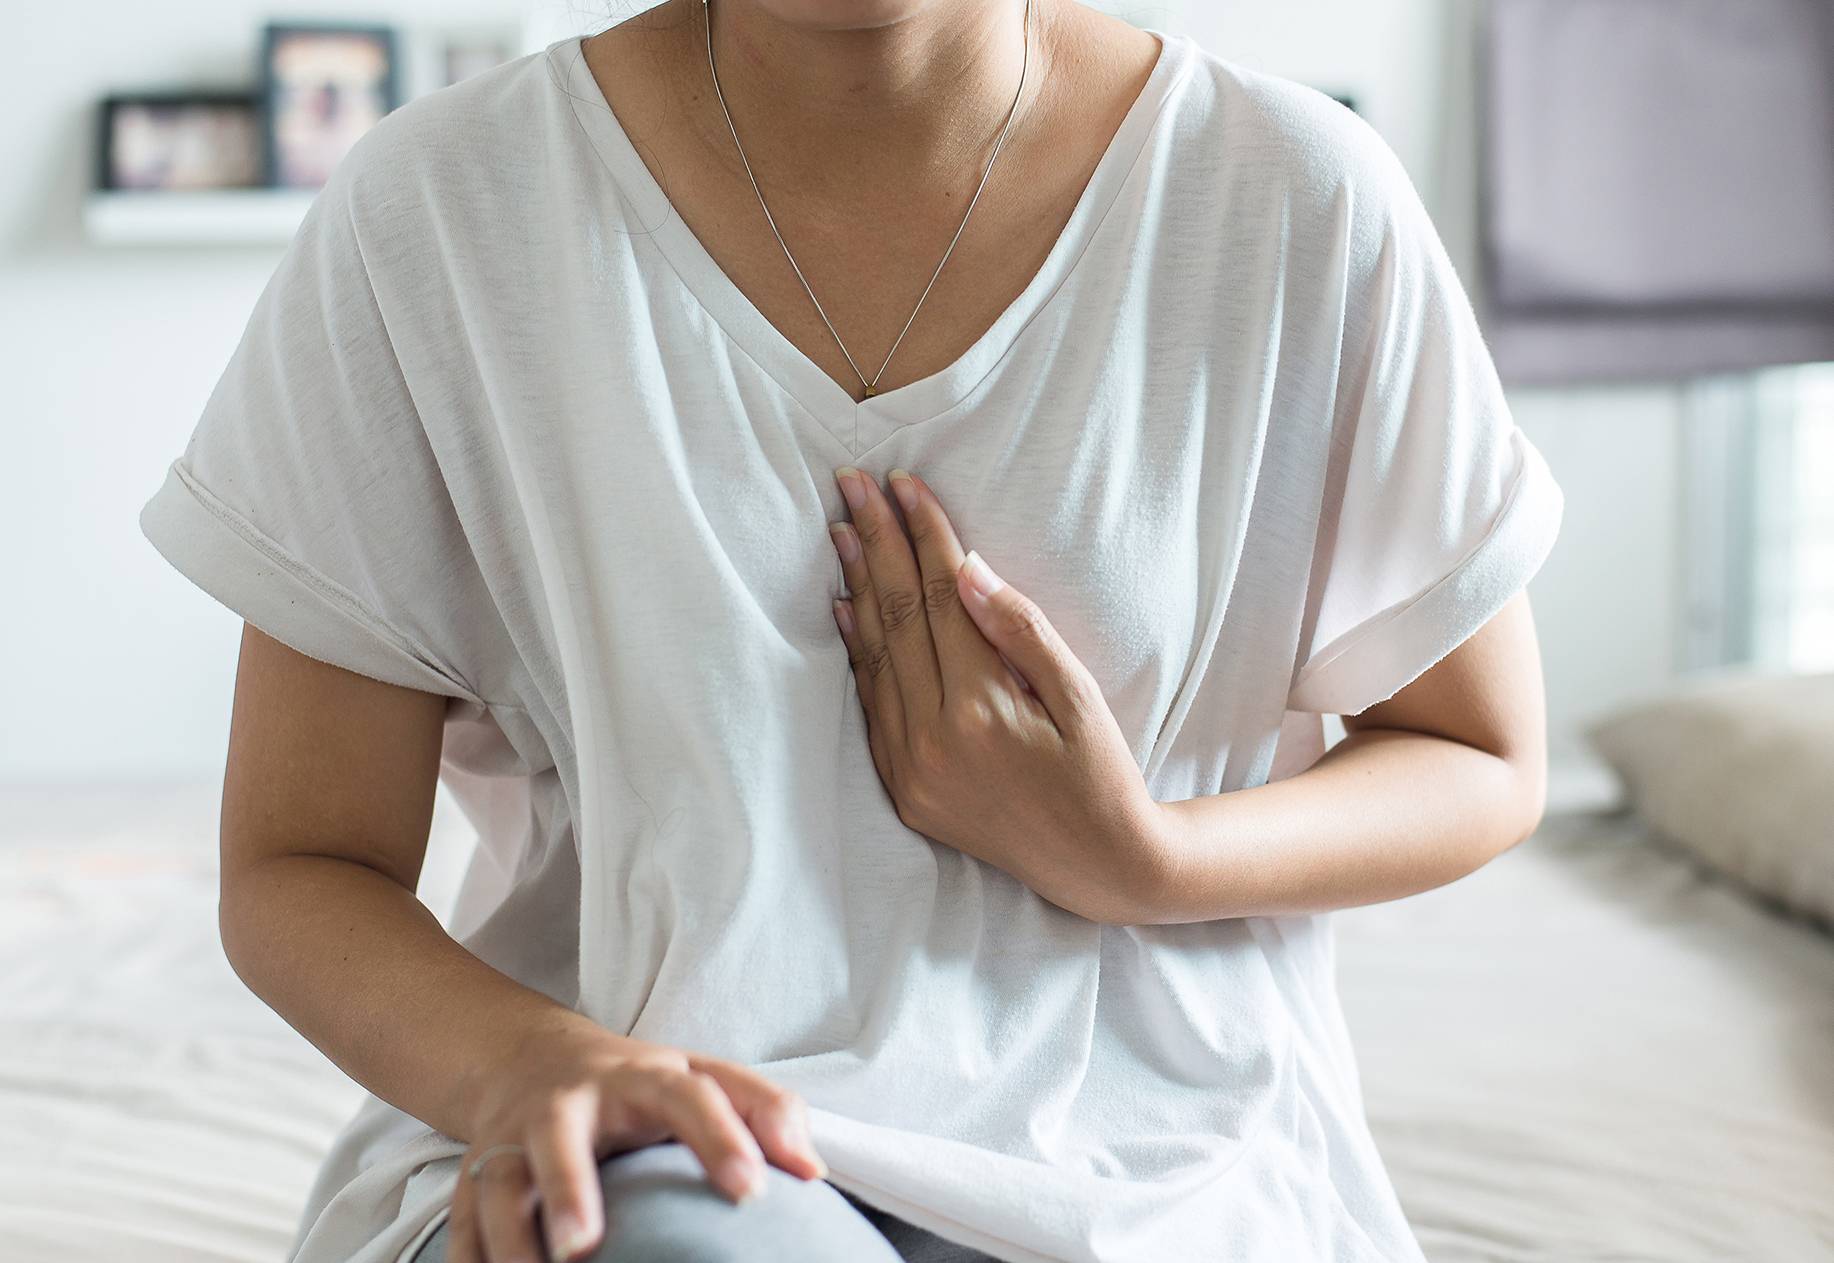 Acid reflux & how to prevent it